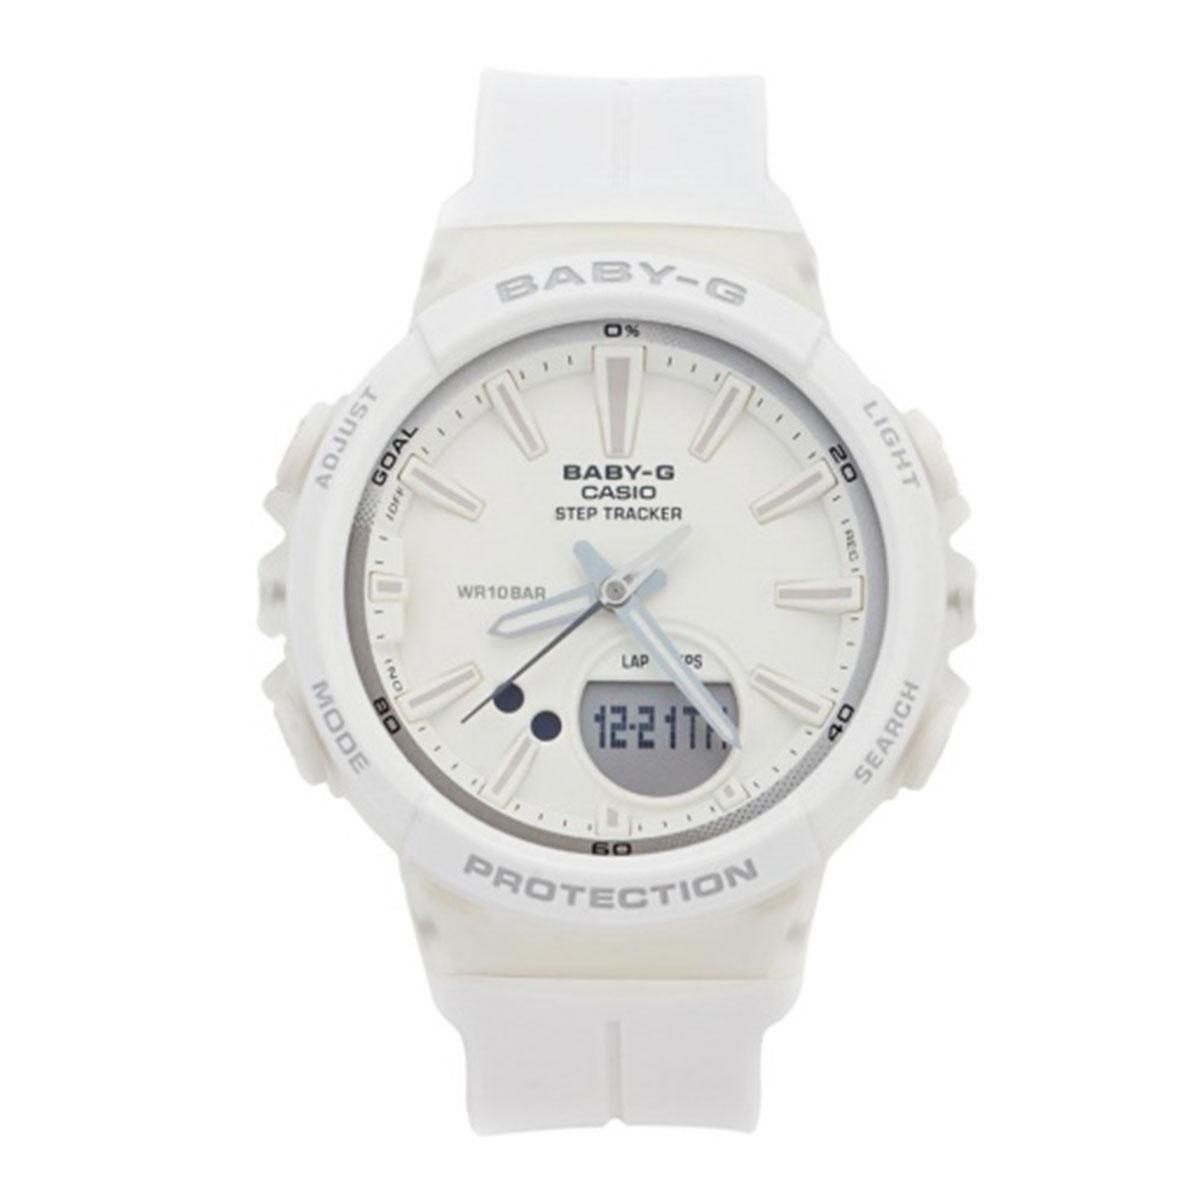 Kelebihan Casio Baby G For Running White Resin Case Bgs 180 3b Jam Tangan Wanita Putih Strap Ladies Nwt Warranty